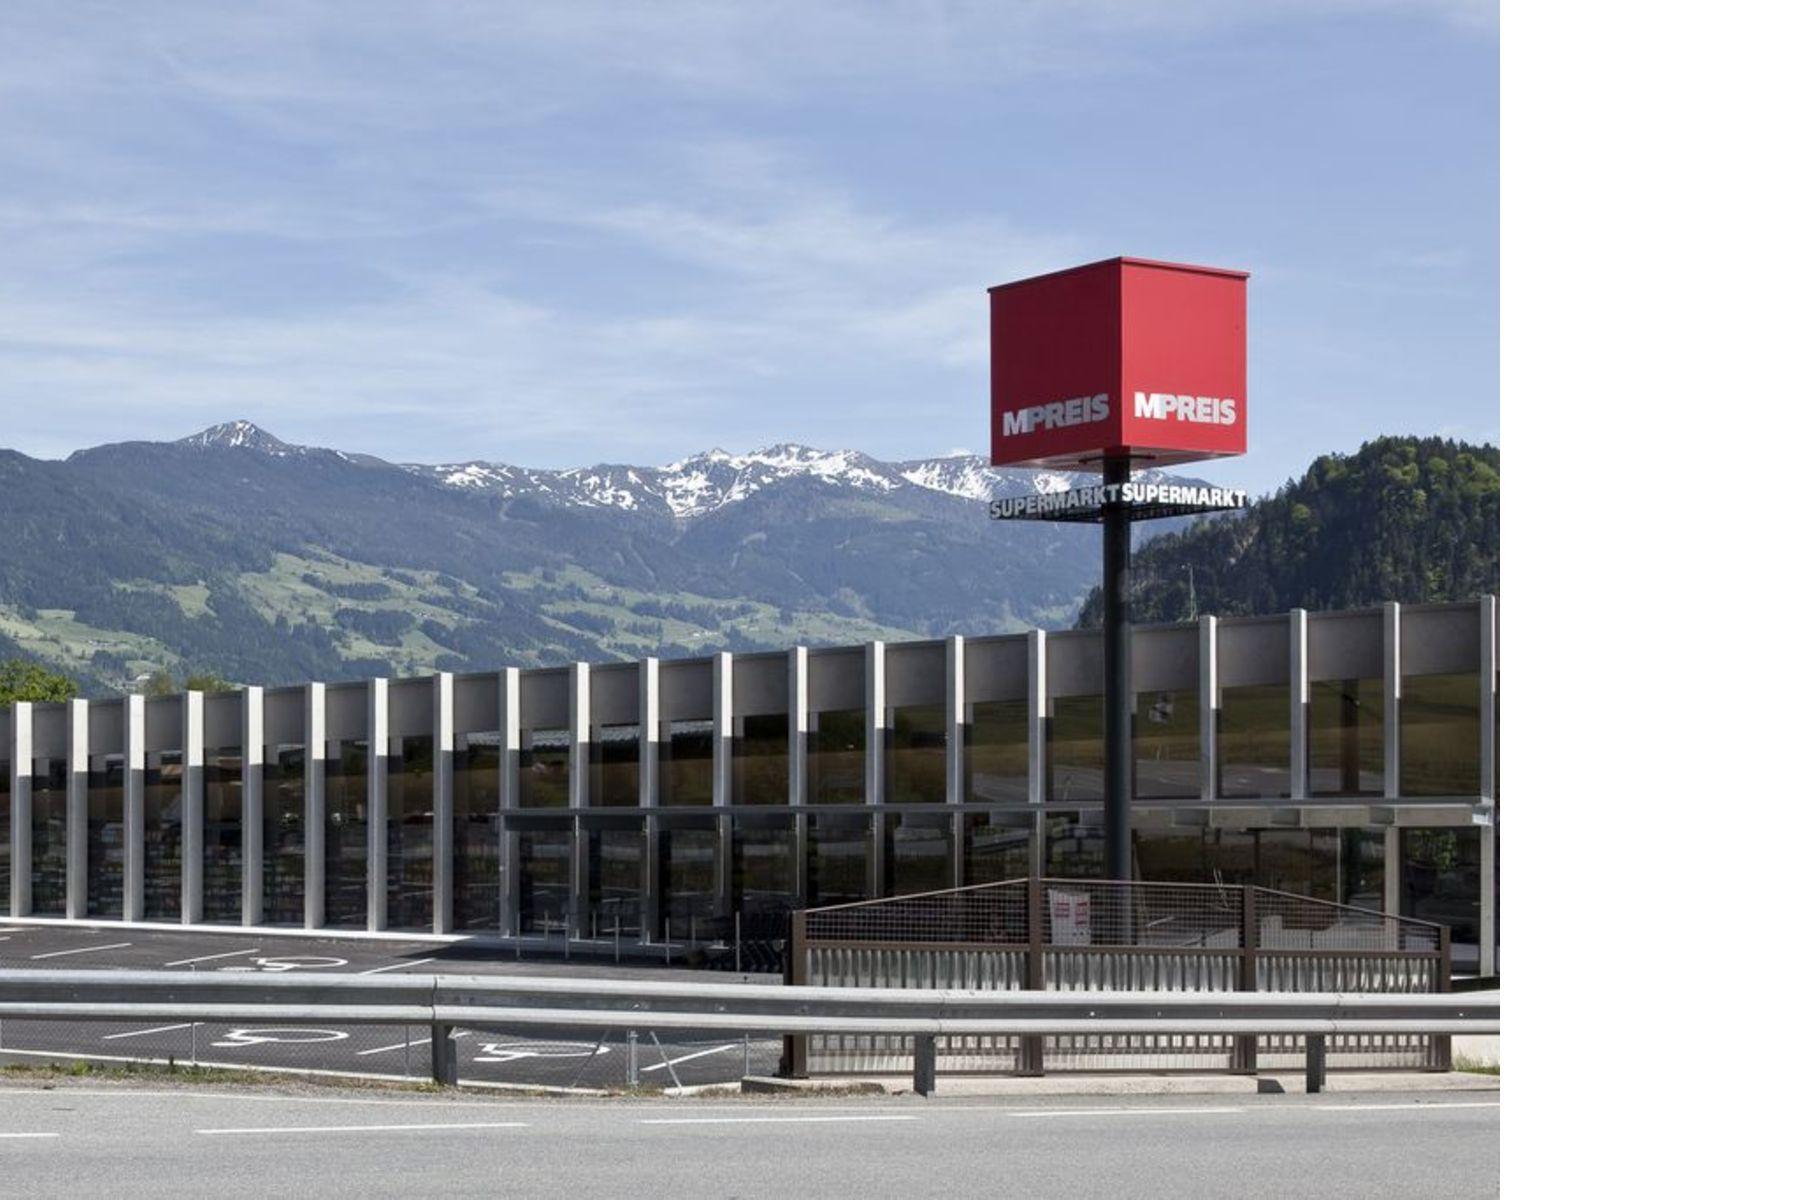 fuegenschuh supermarkt mpreis in wiesing floornature. Black Bedroom Furniture Sets. Home Design Ideas